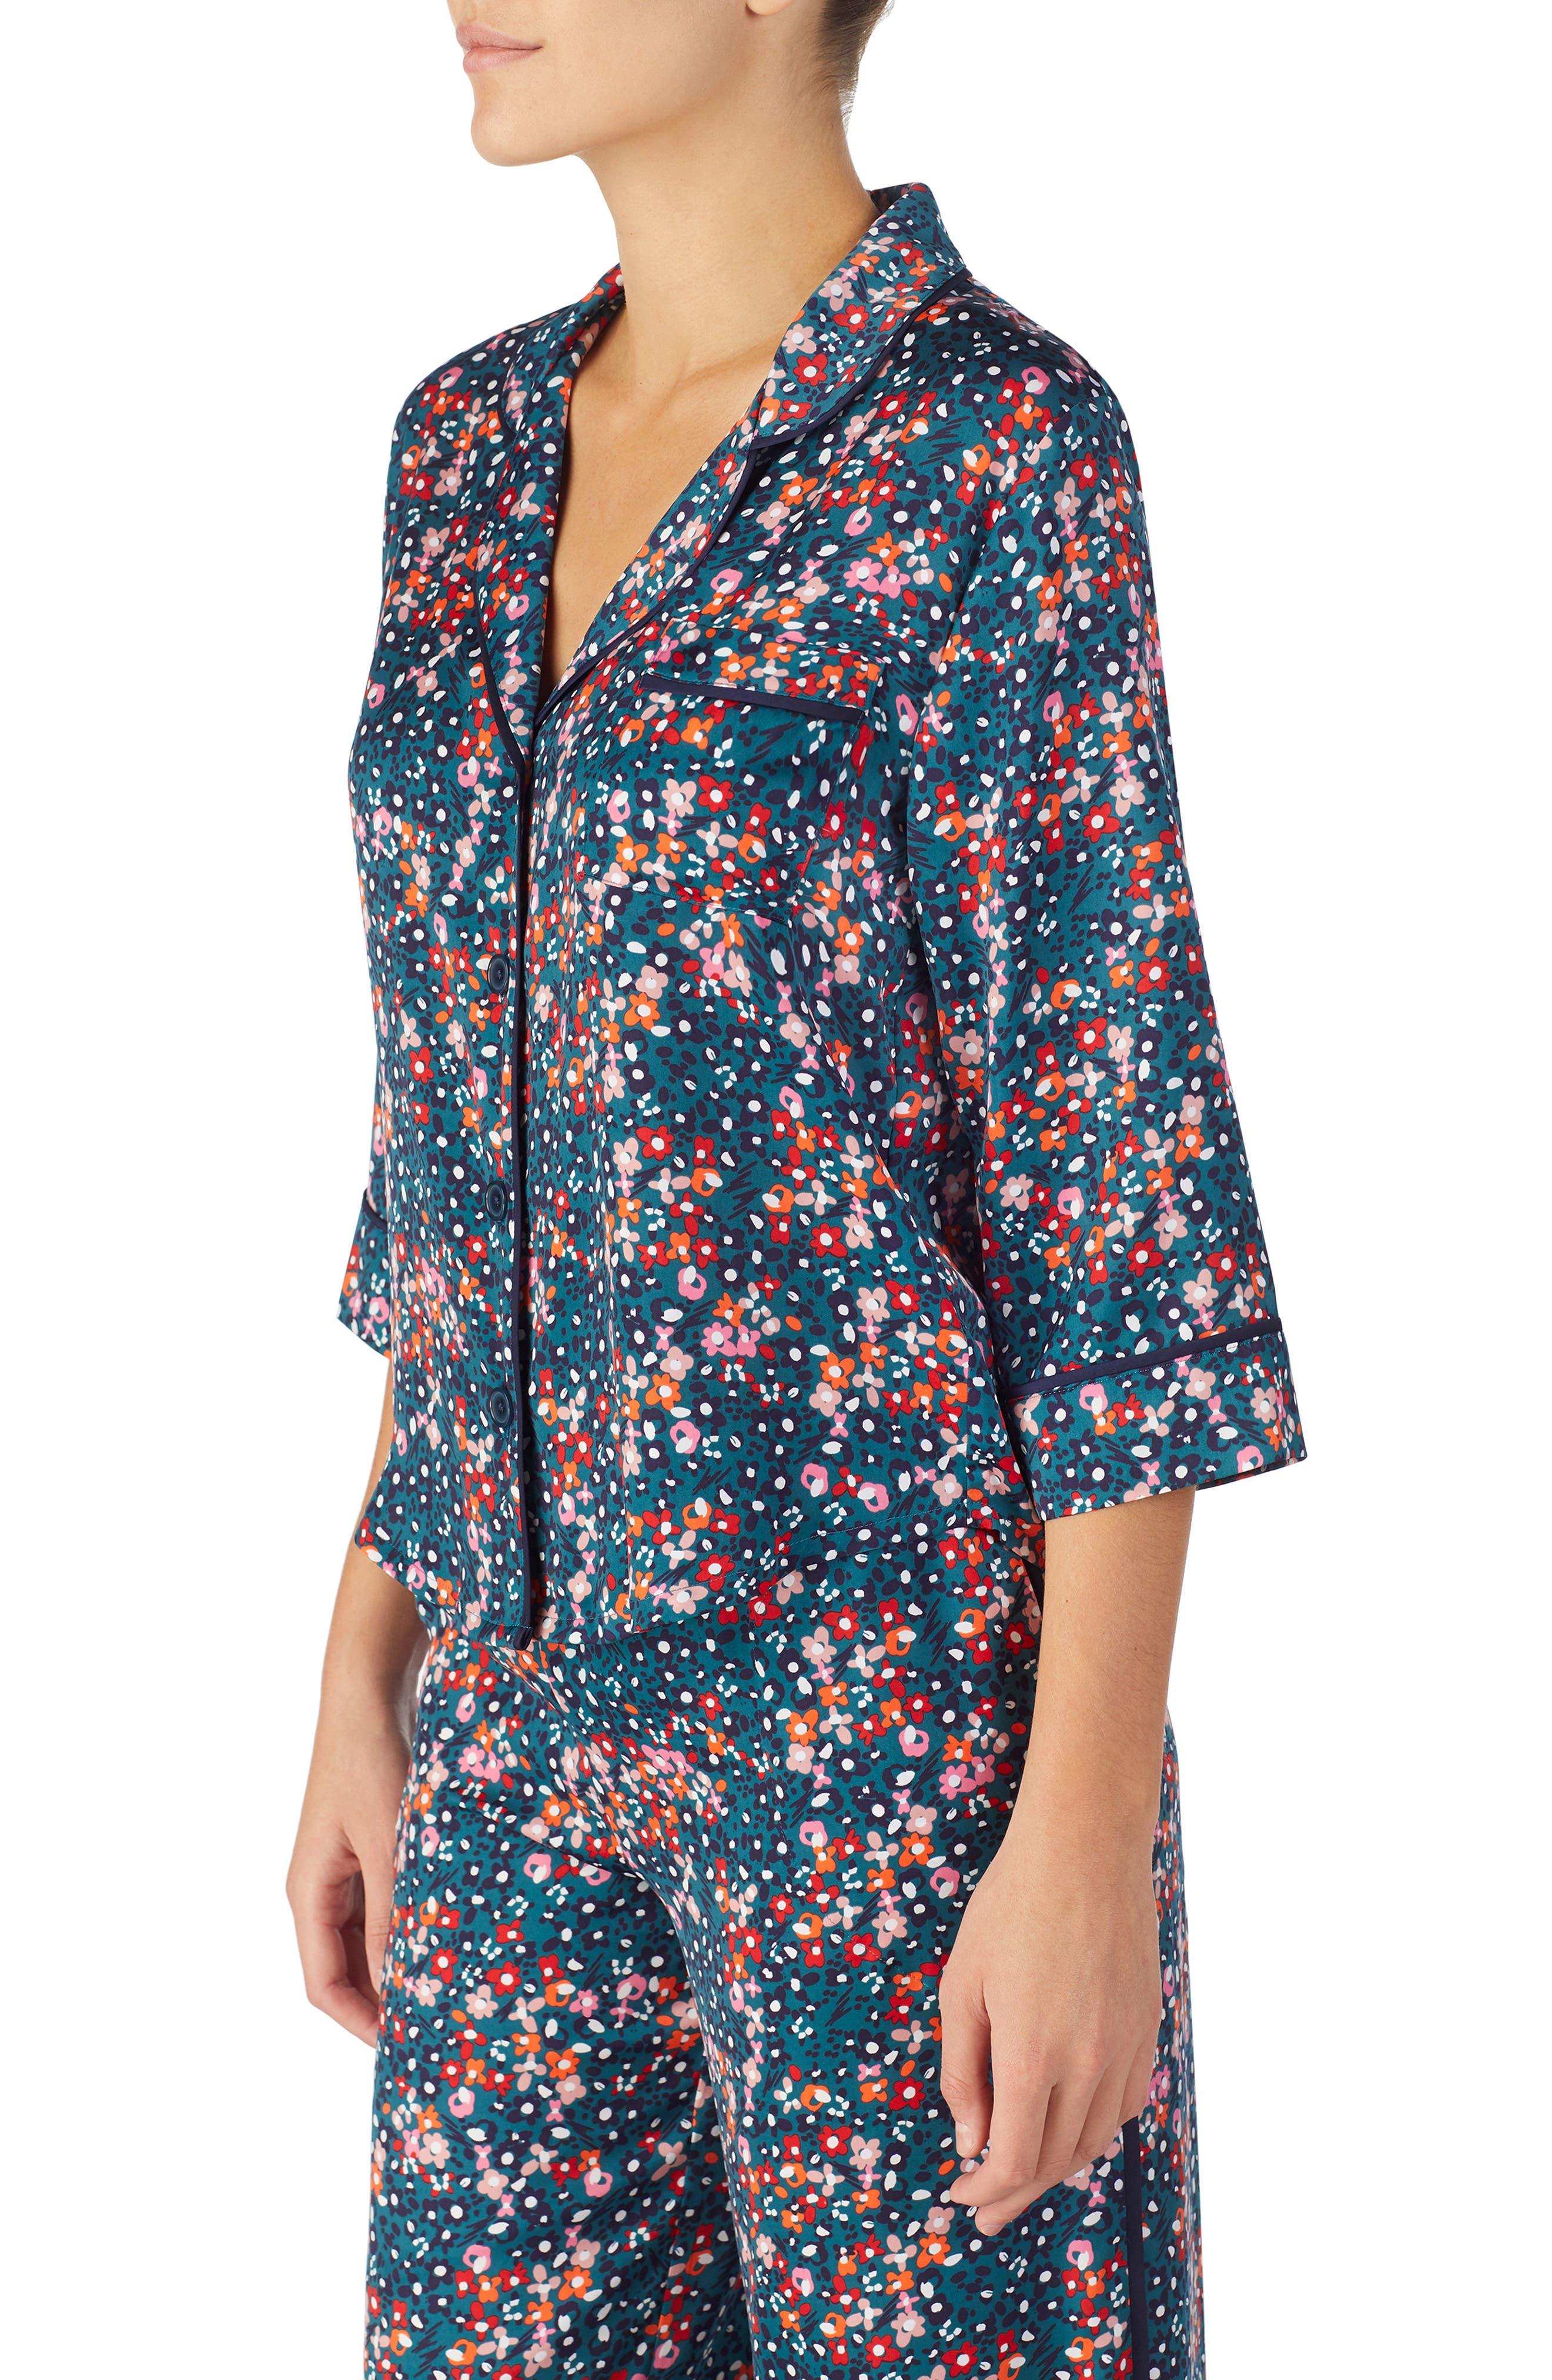 Pajama Top,                             Alternate thumbnail 3, color,                             DITSY FLORAL